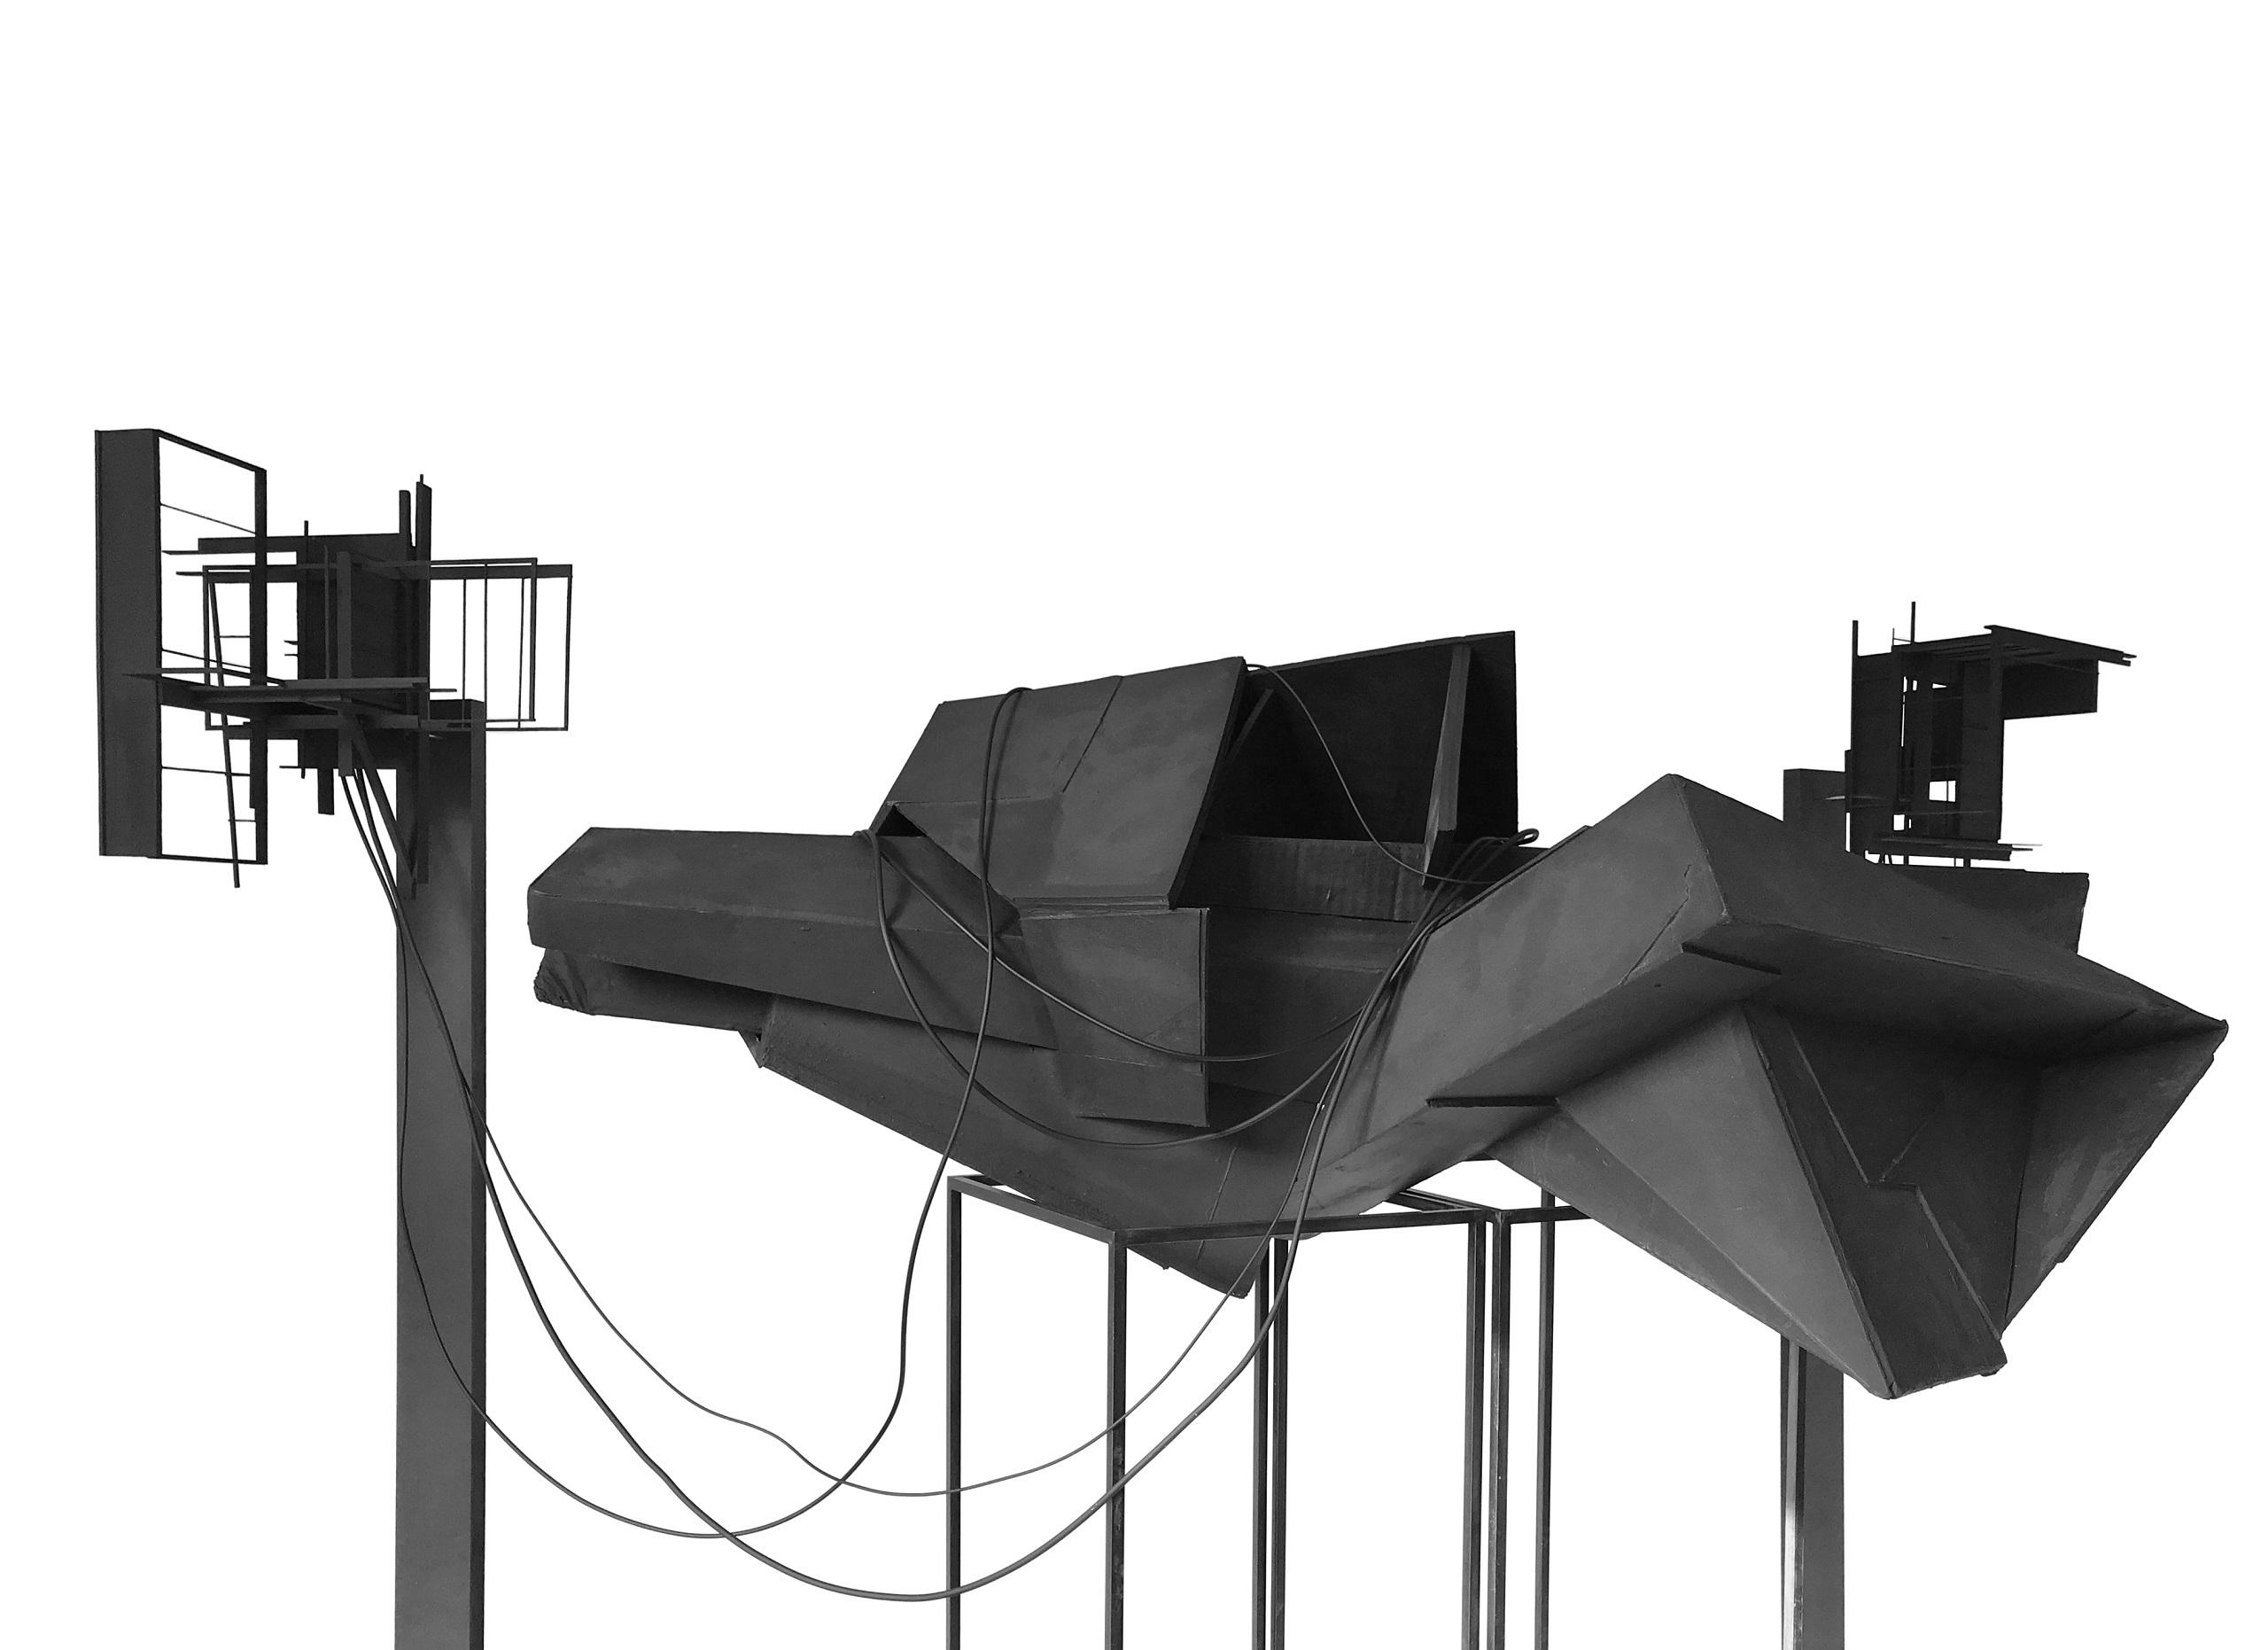 Karl-Heinz Bogner, Installation Ort_Station (Variante _01), 2019 Holz, MDF, Karton, Stahl Höhe: ca. 160 cm